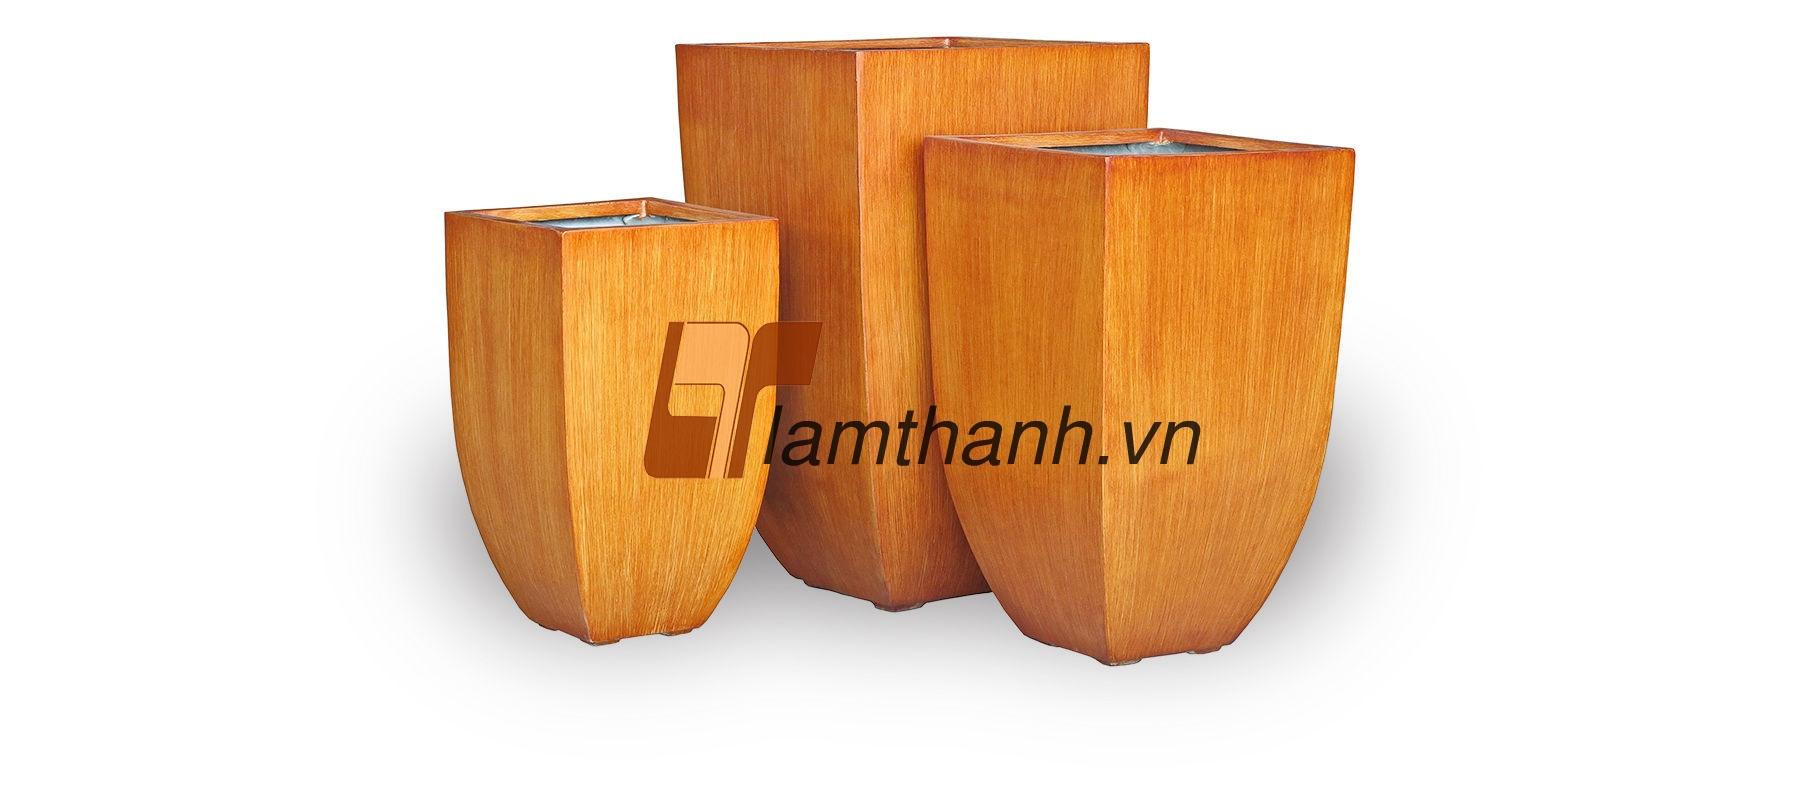 vietnam polystone, fiberglass 03